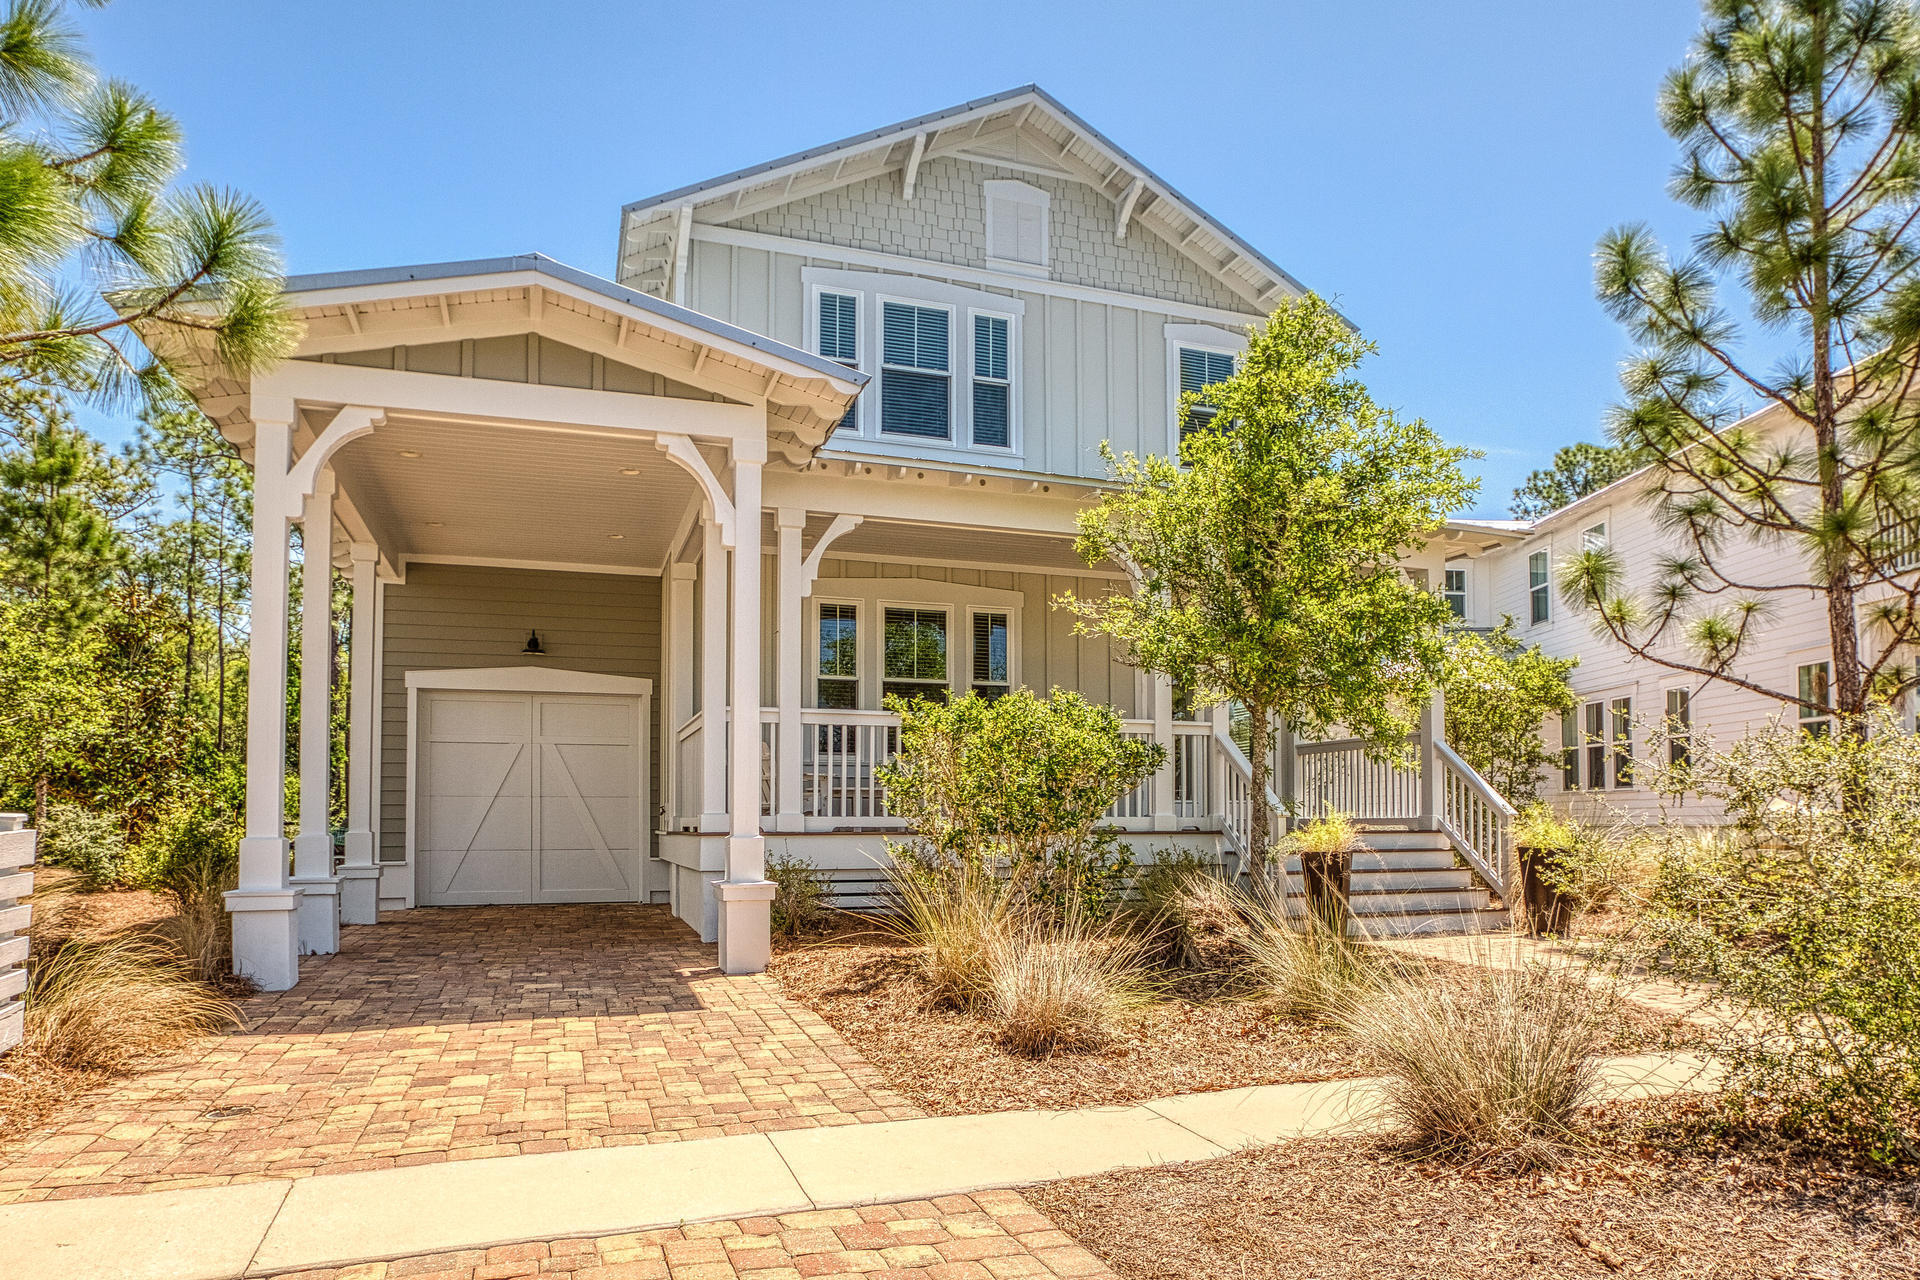 Photo of home for sale at 58 Salamander, Santa Rosa Beach FL